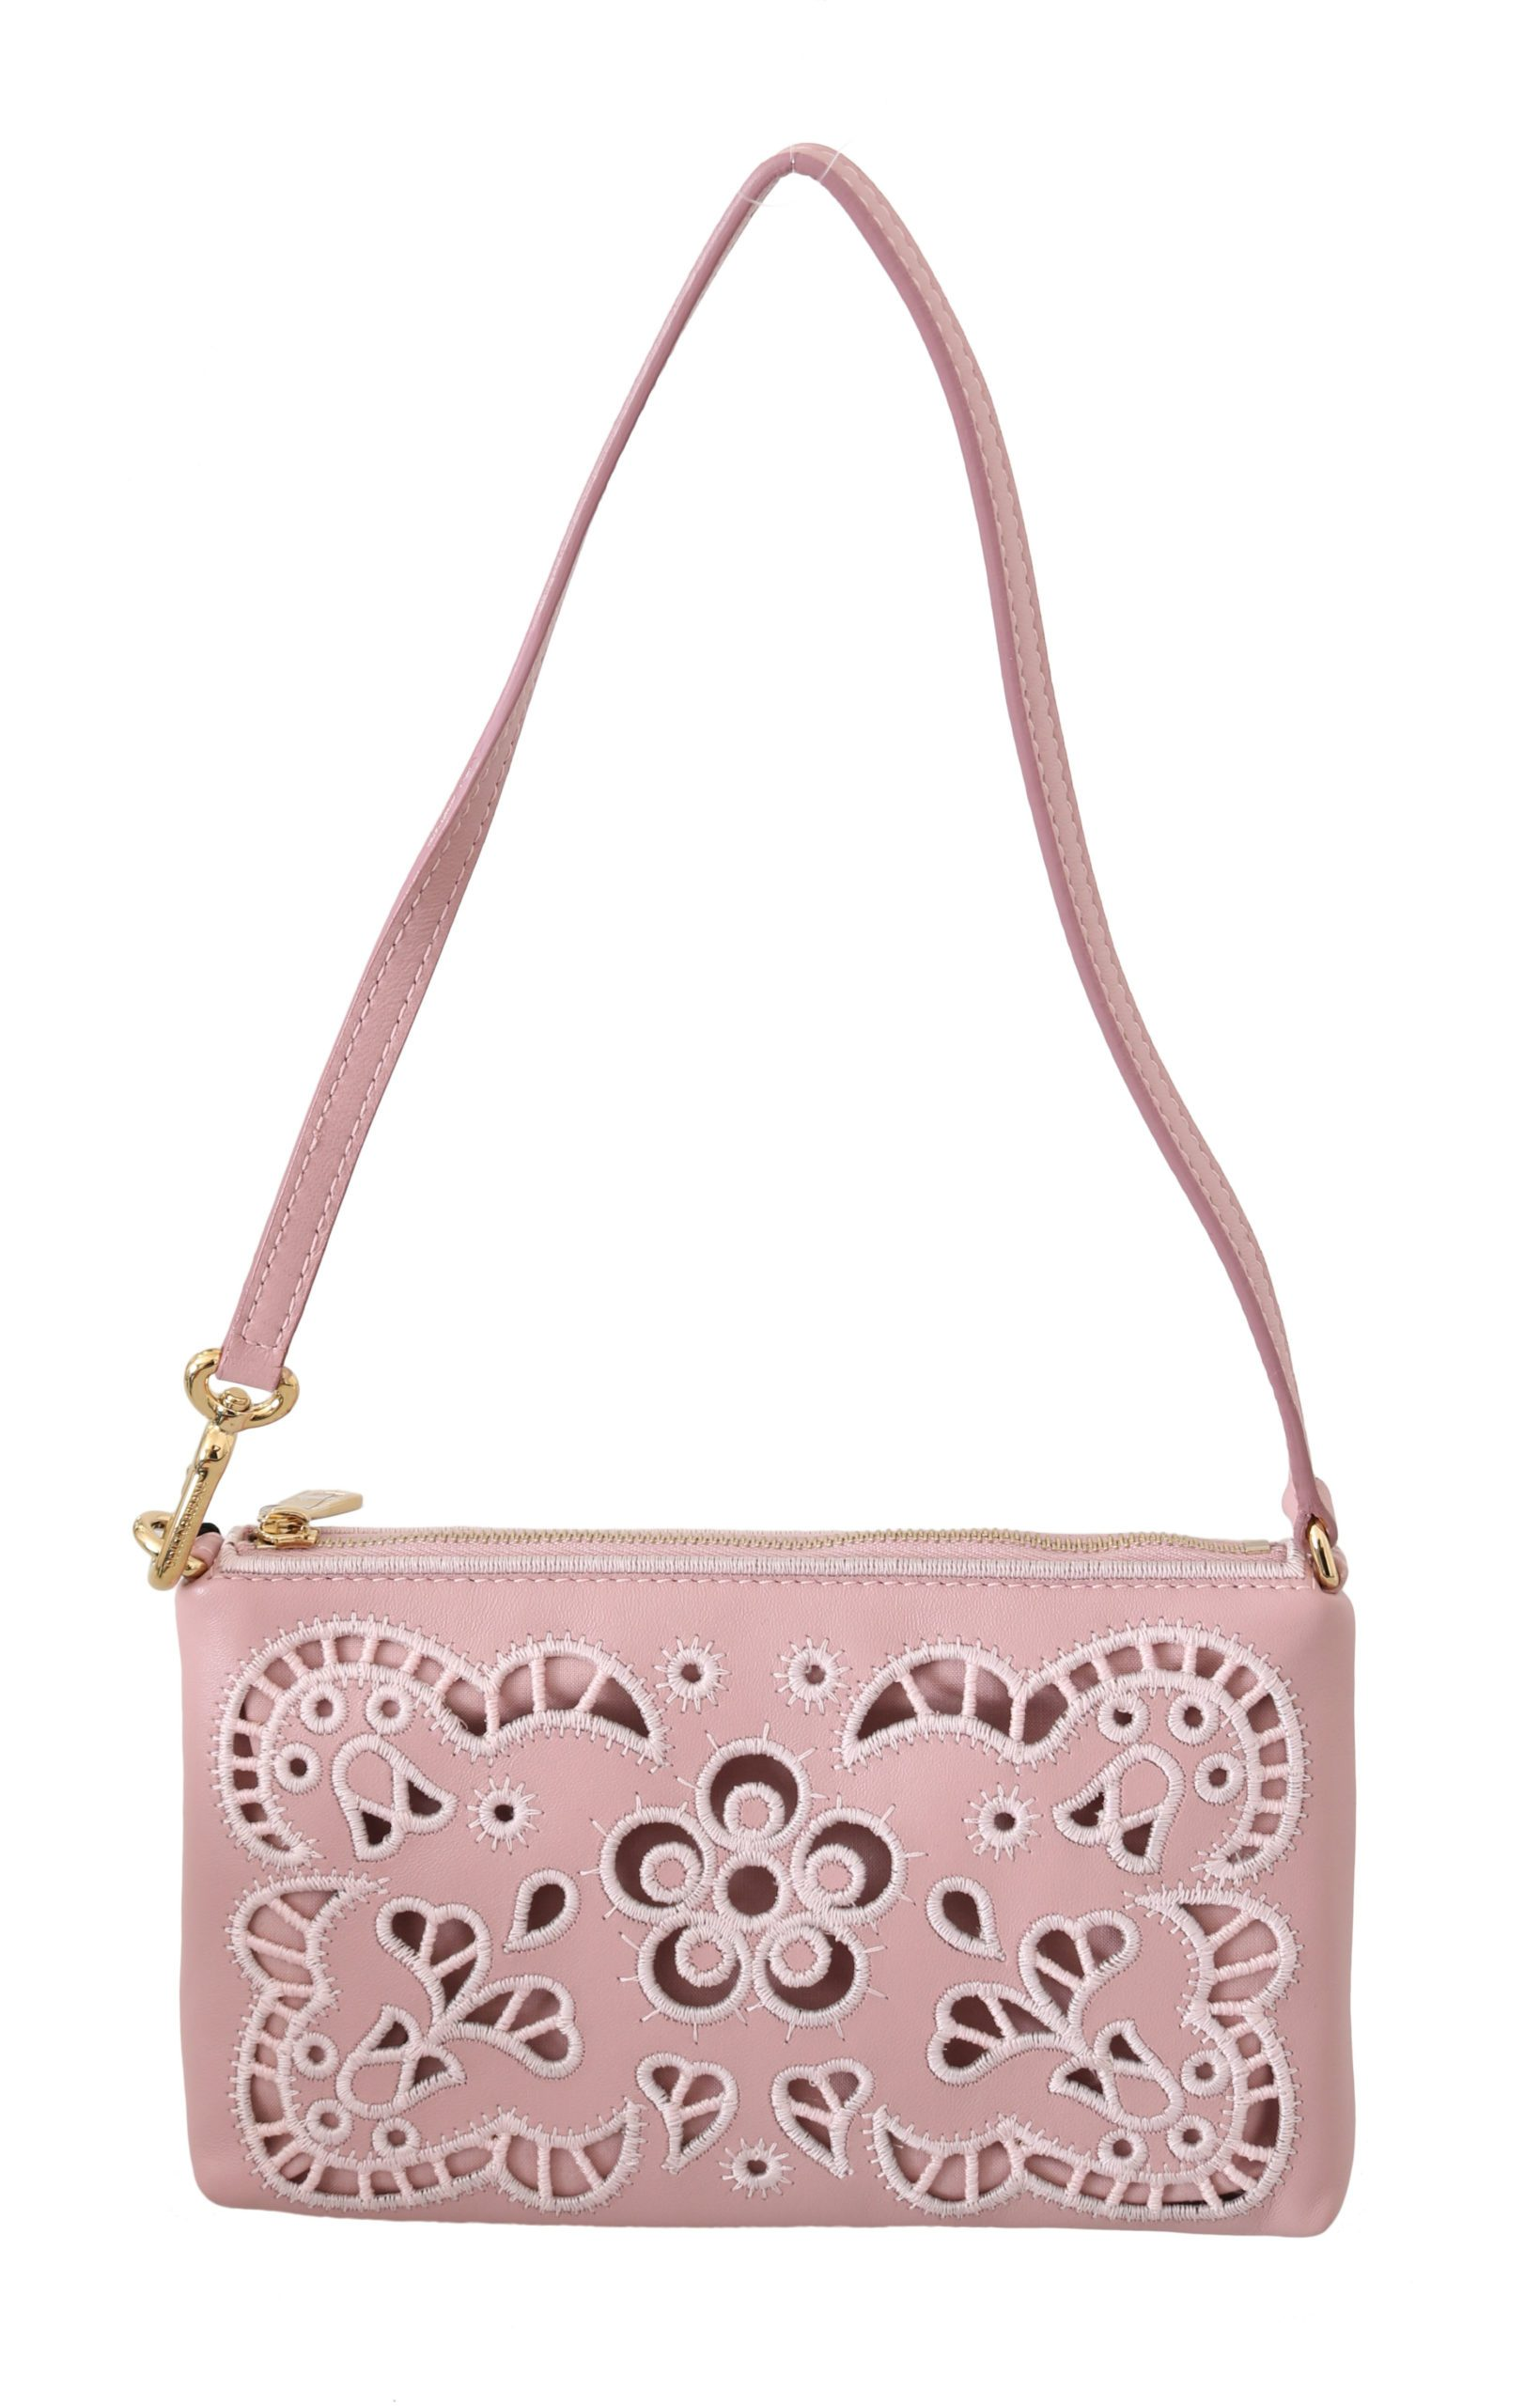 Dolce & Gabbana Women's Cutout Mini Leather Shoulder Bag Pink VAS8872